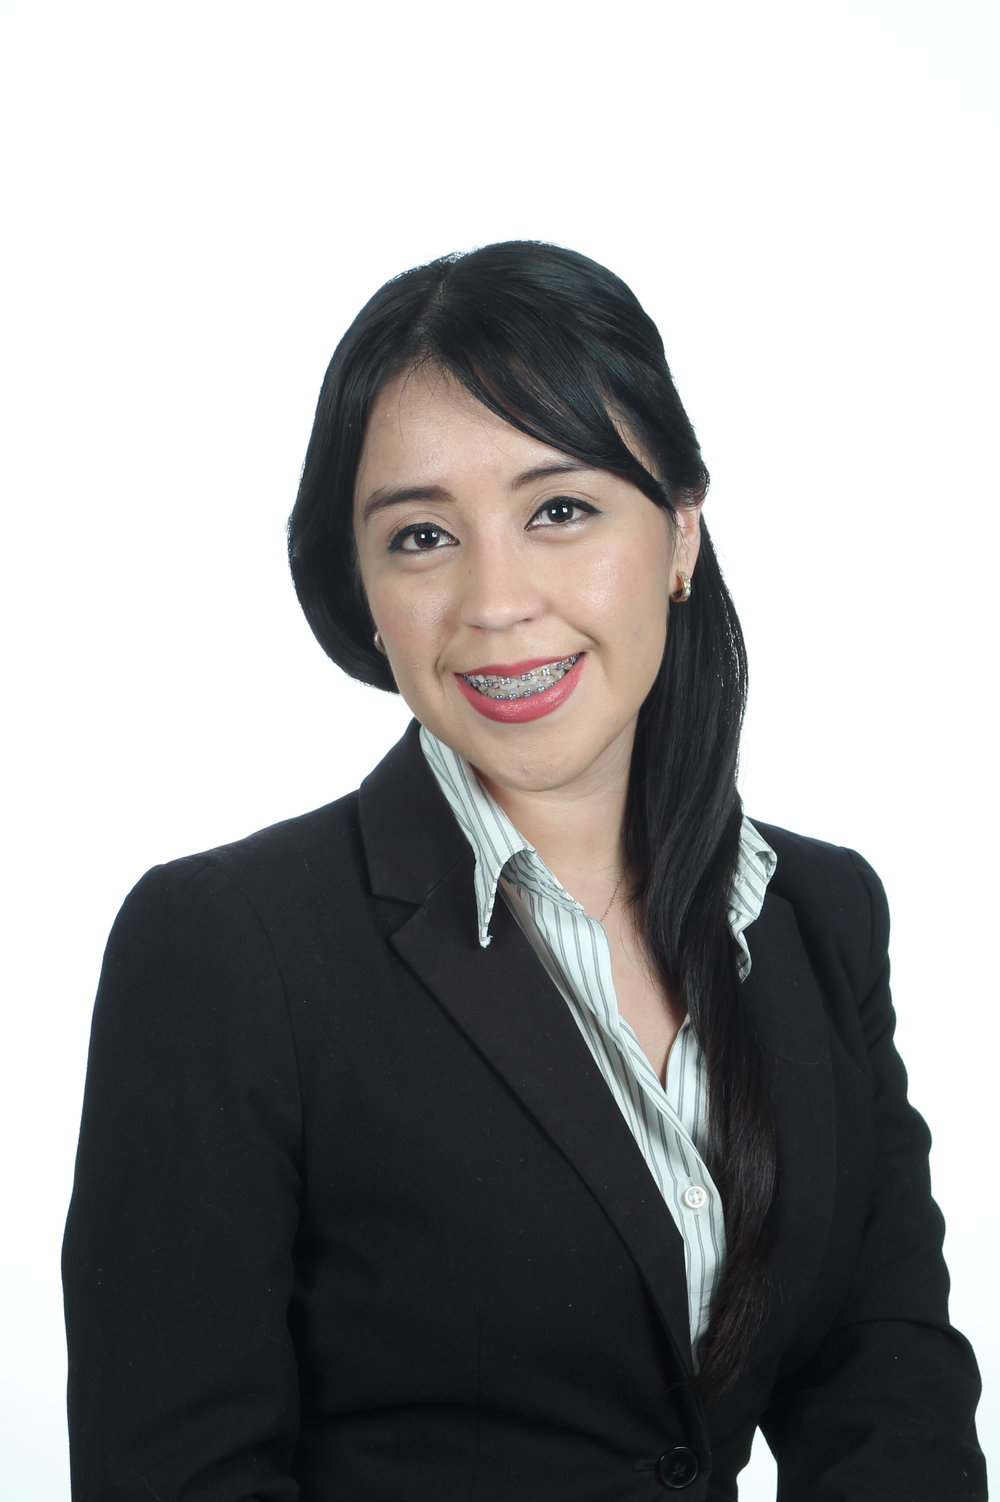 Sandra Monserrat Díaz Cruces.JPG